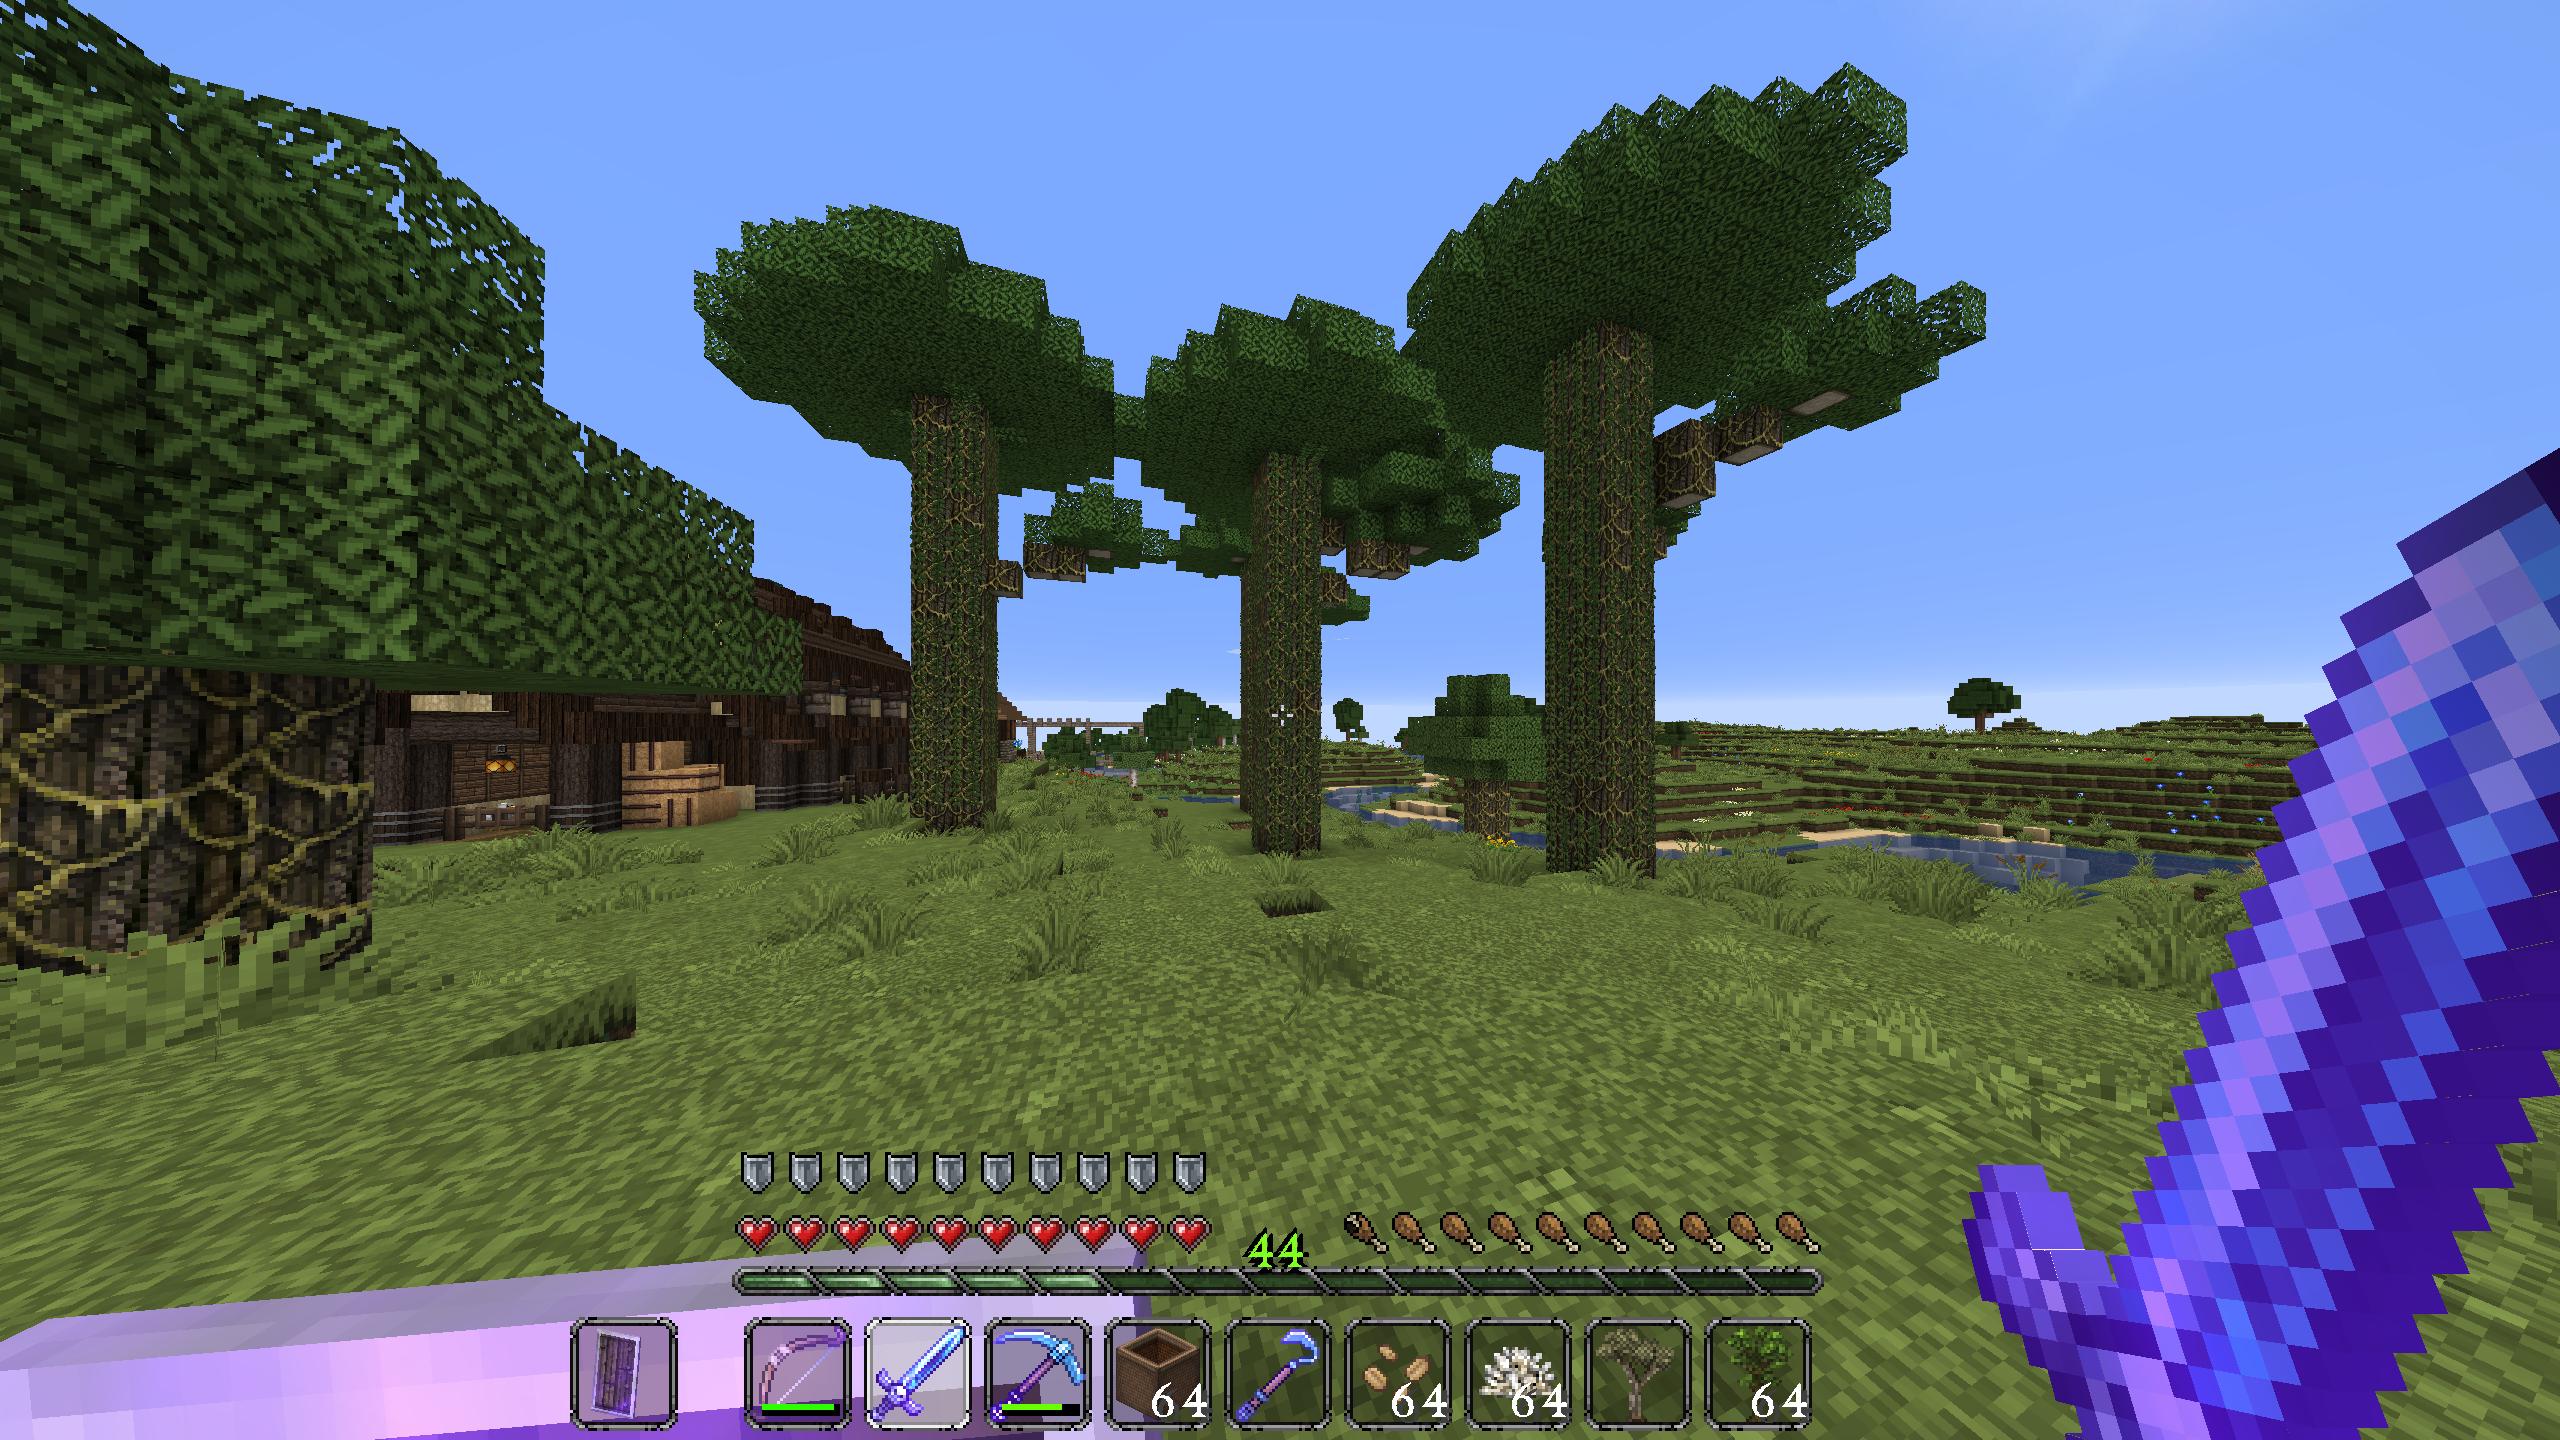 Giant Jungle trees - Survival Mode - Minecraft: Java Edition